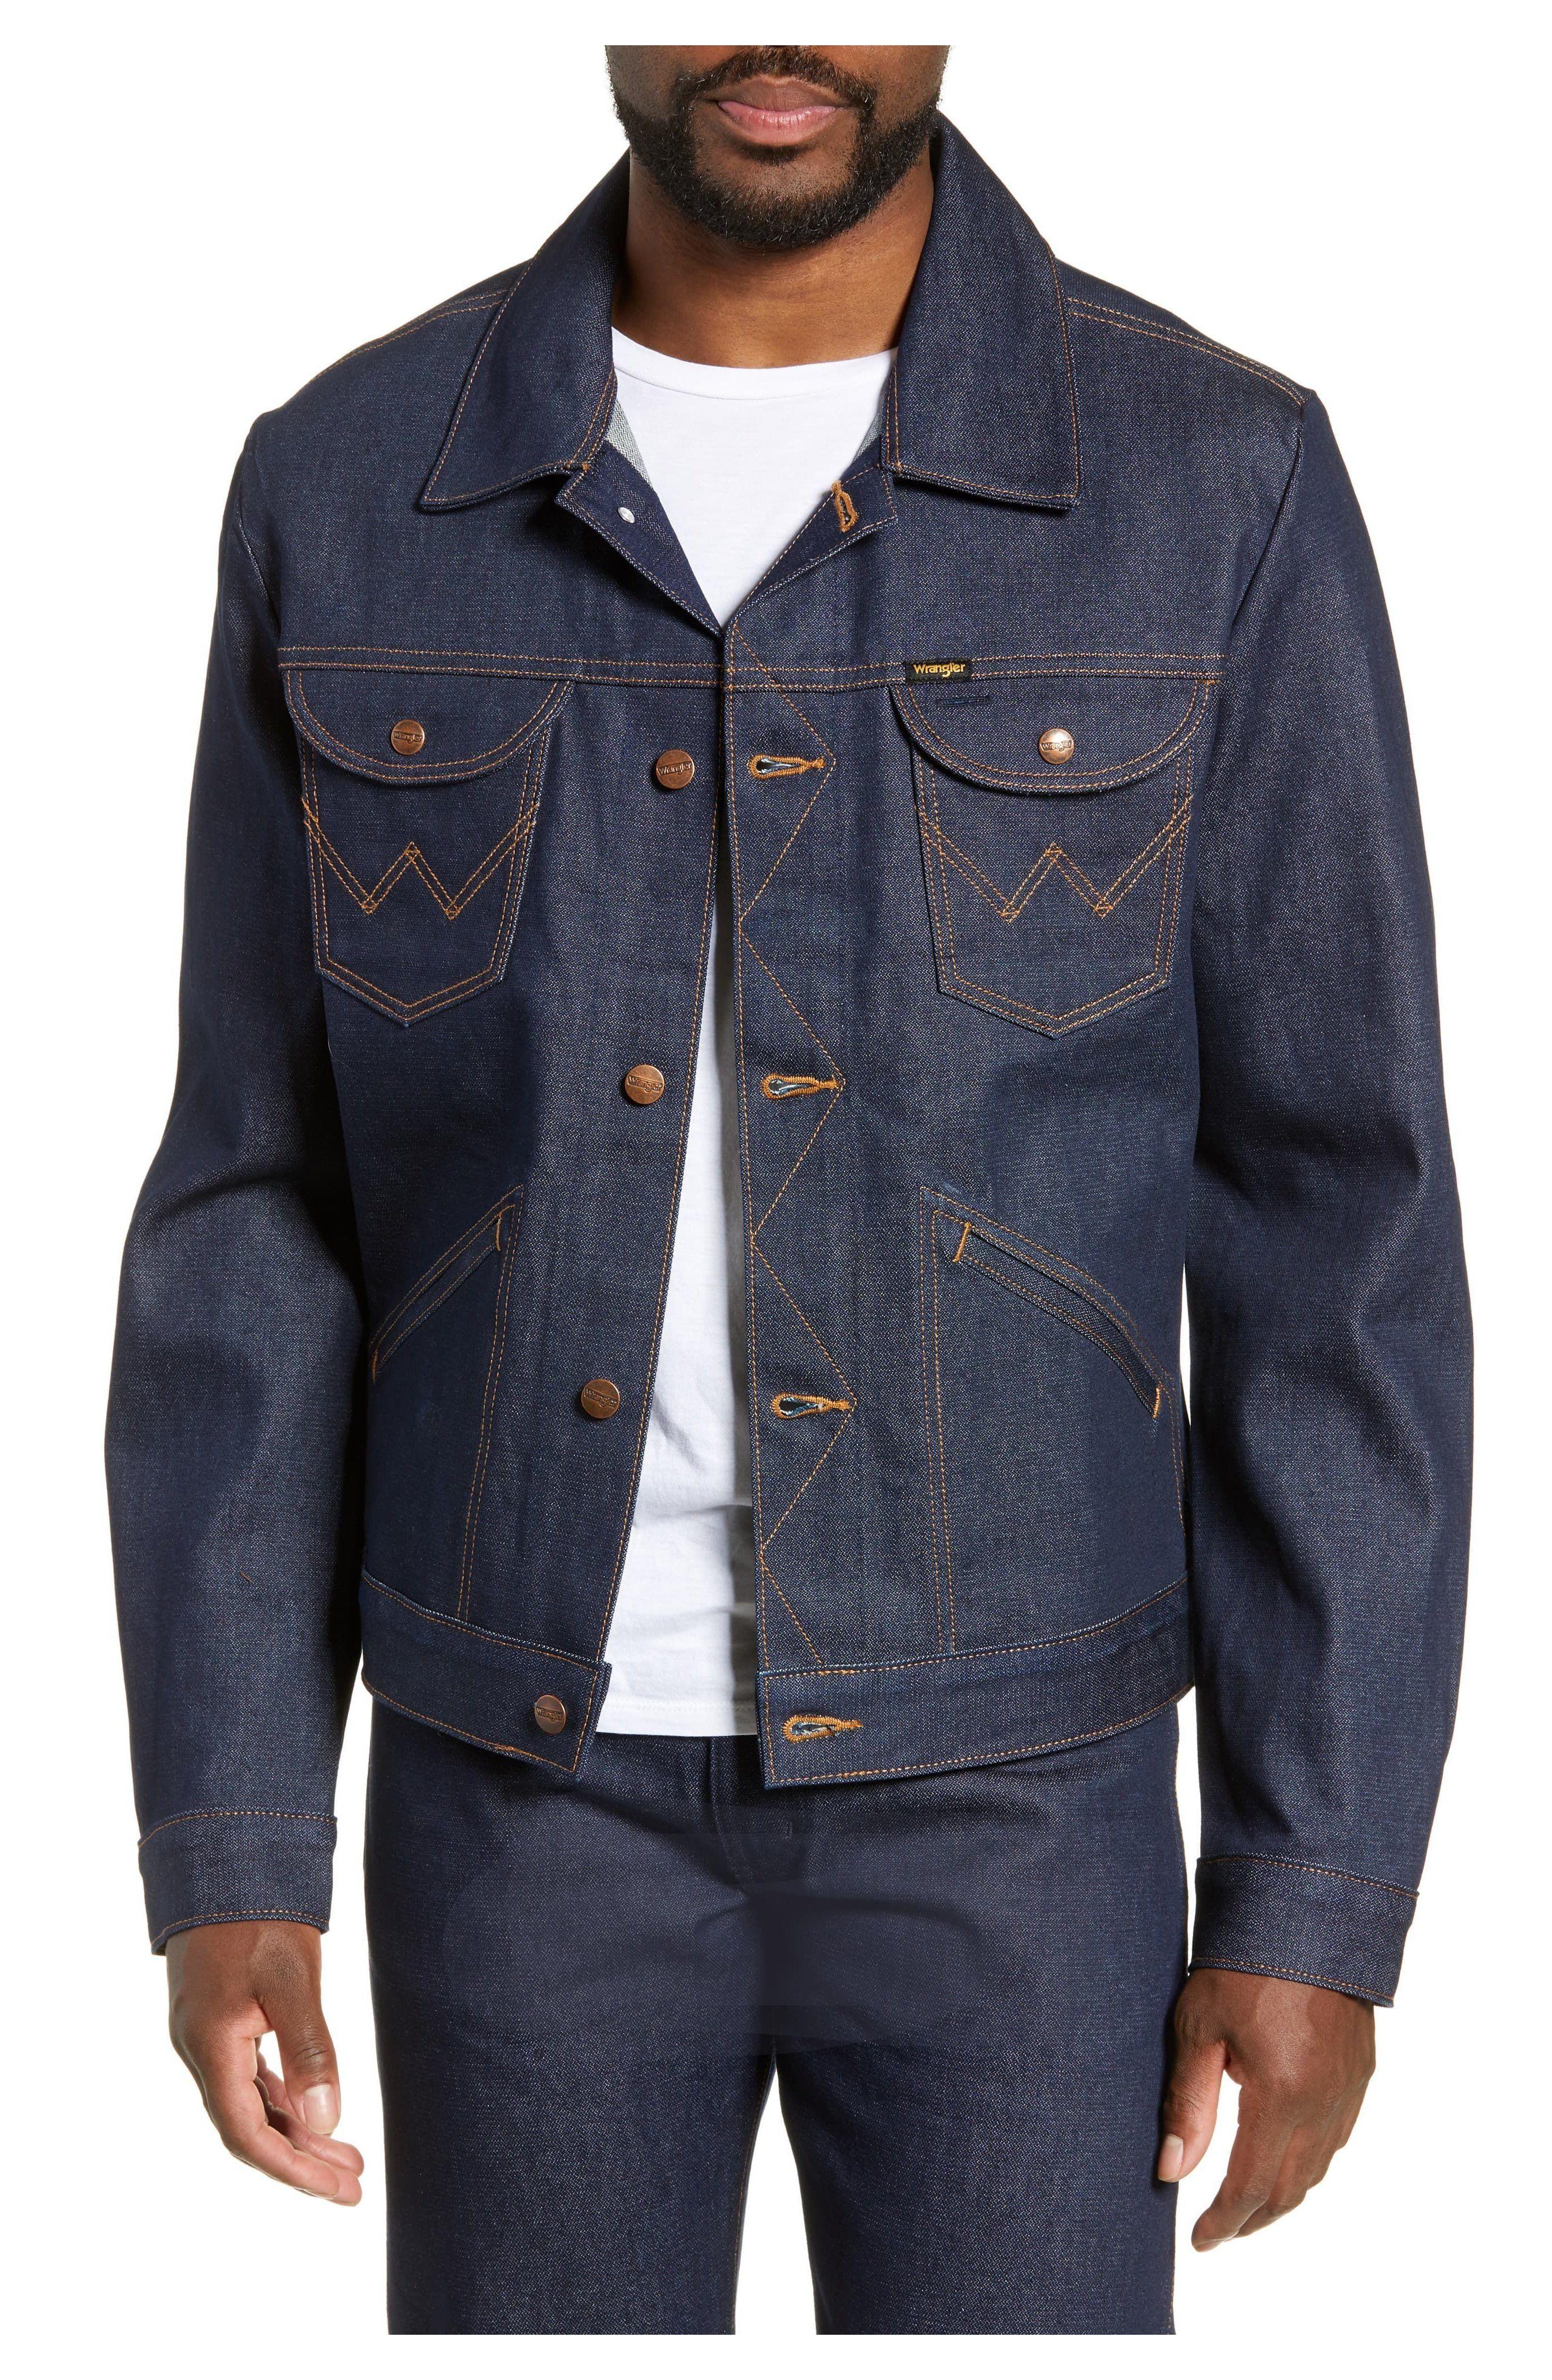 Wrangler Icons Denim Jacket Nordstrom Wrangler Denim Jacket Men Wranglerdenimjacketmen From The In 2021 Denim Jacket Men Style Denim Jacket Men Raw Denim Jacket [ 4208 x 2744 Pixel ]